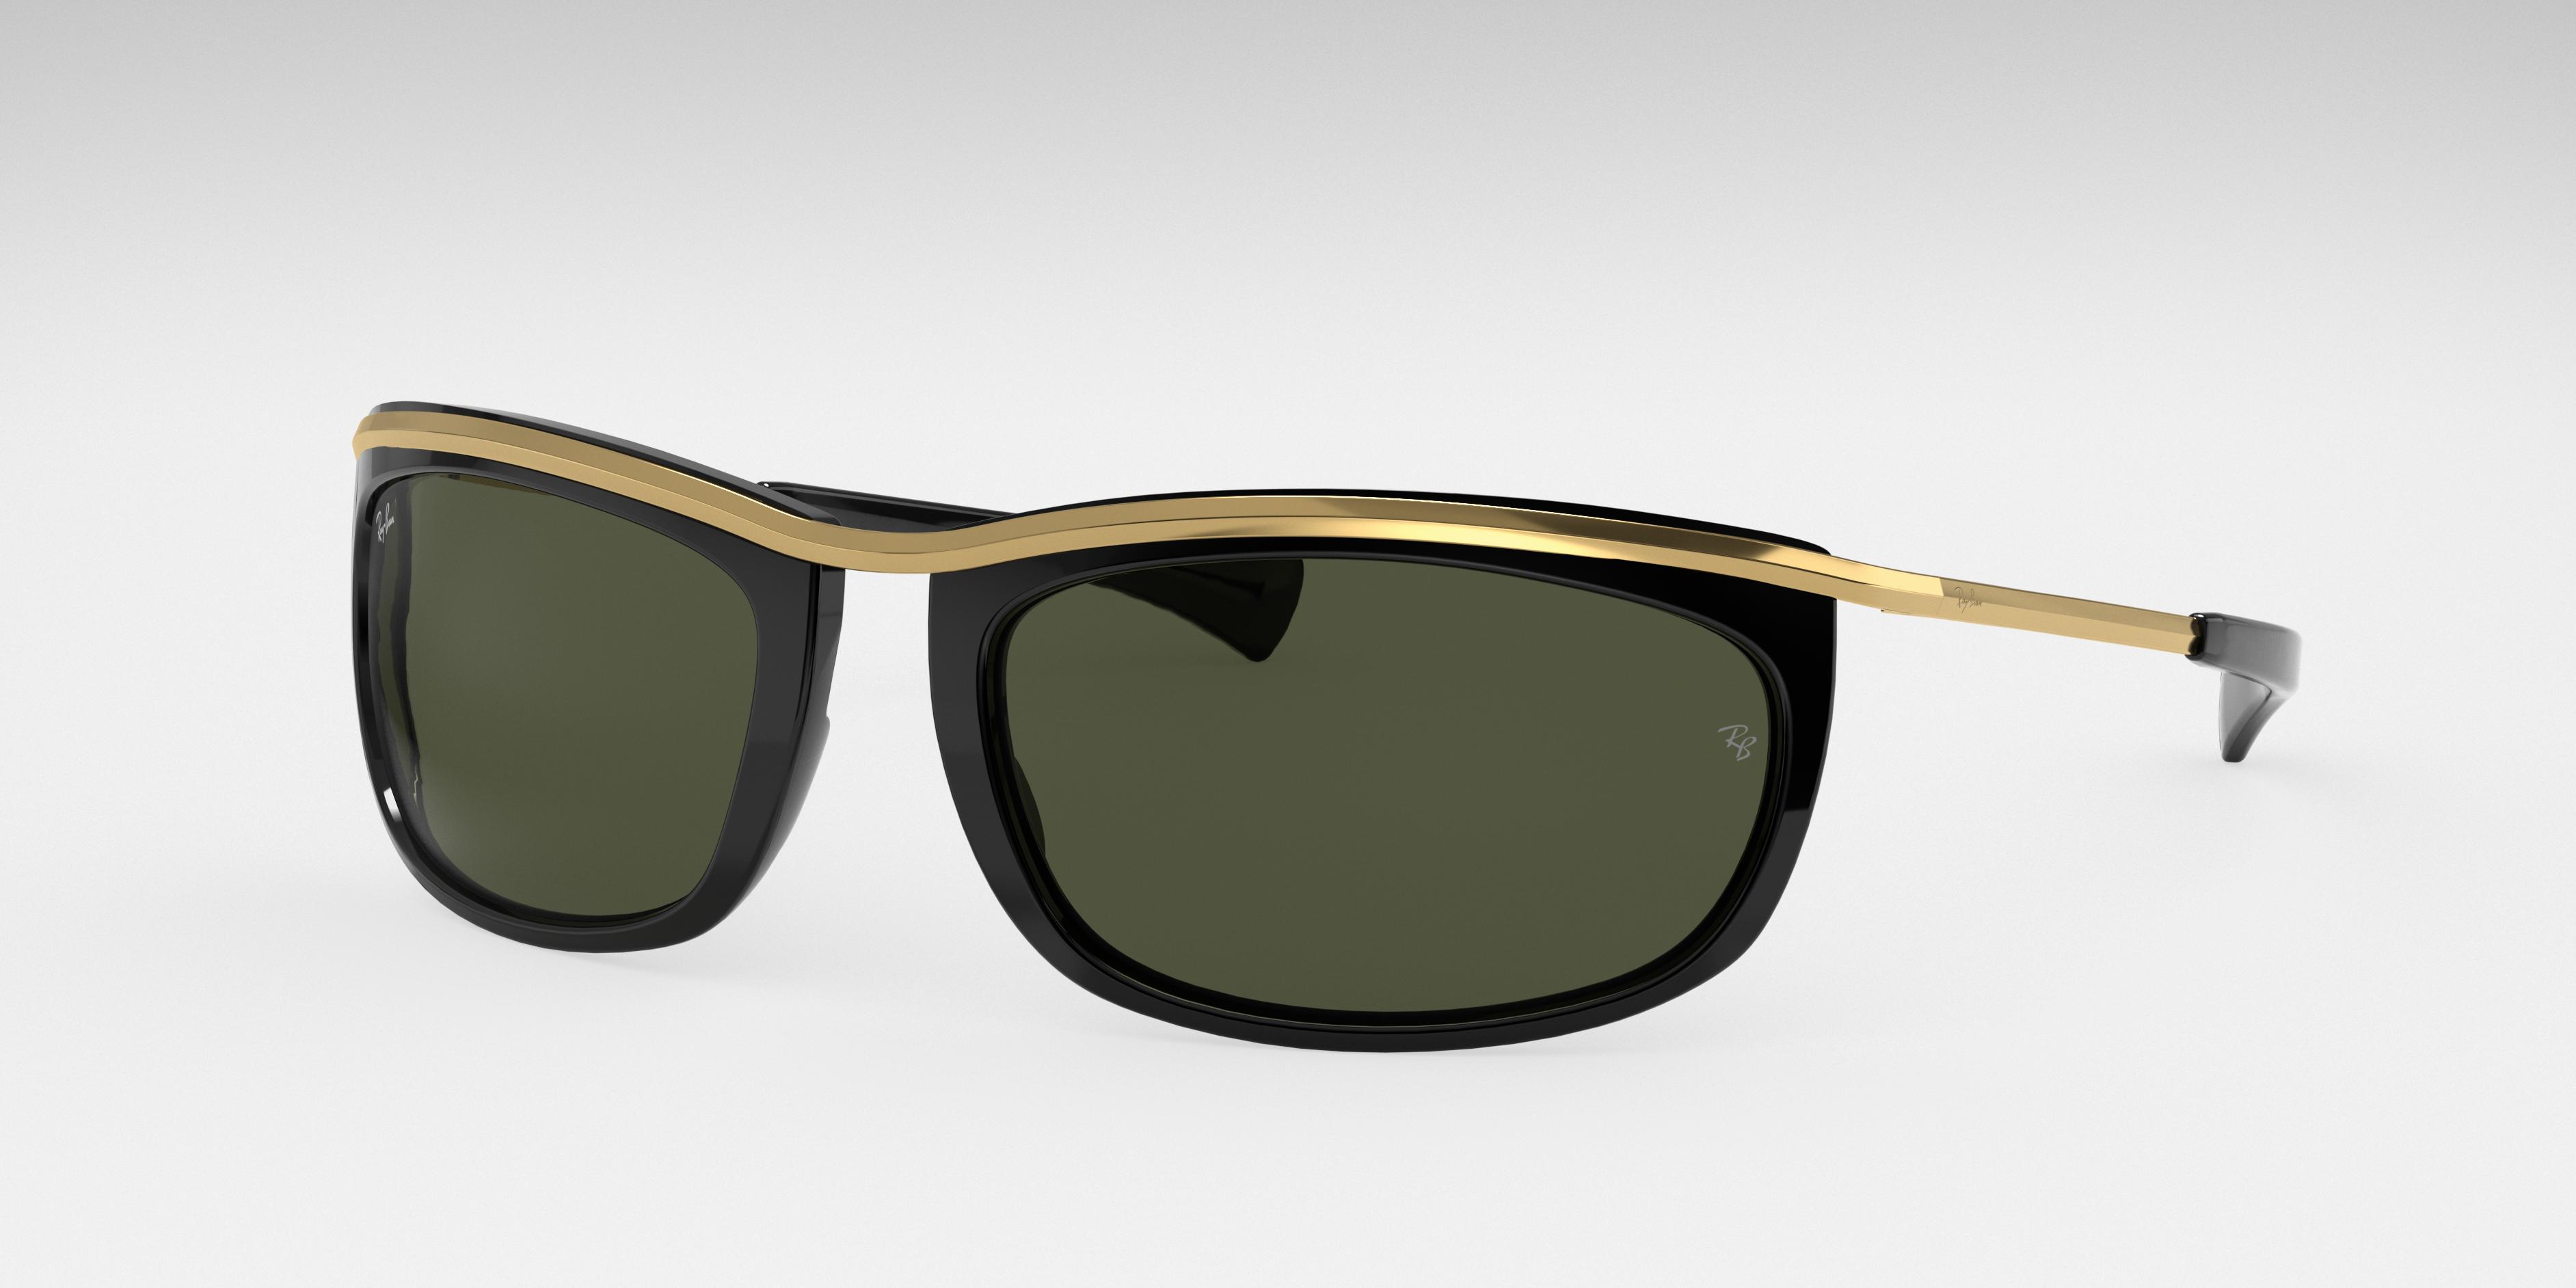 Ray-Ban Olympian I Gold, Green Lenses - RB2319